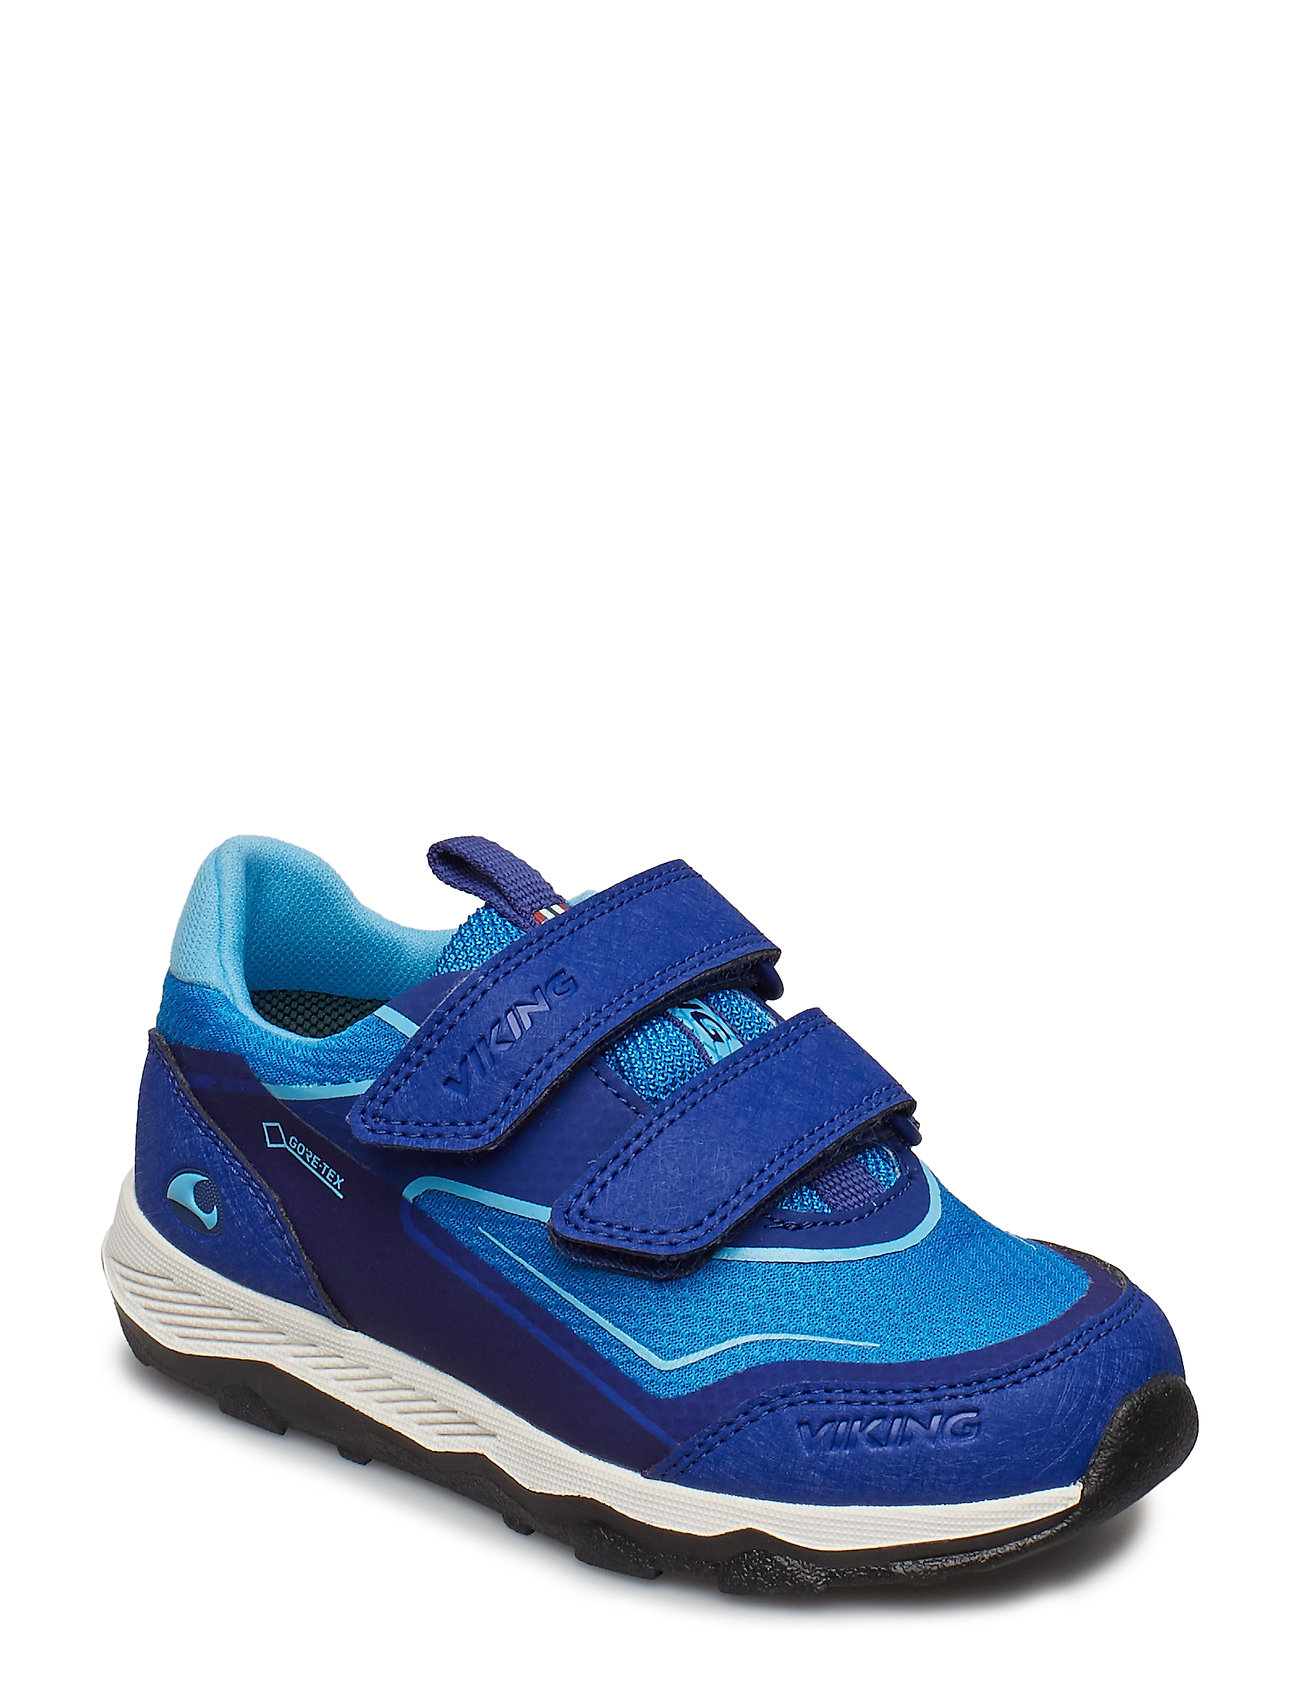 33ea879ee5f5 Evanger Low Gtx (Dark Blue blue) (900 kr) - Viking -